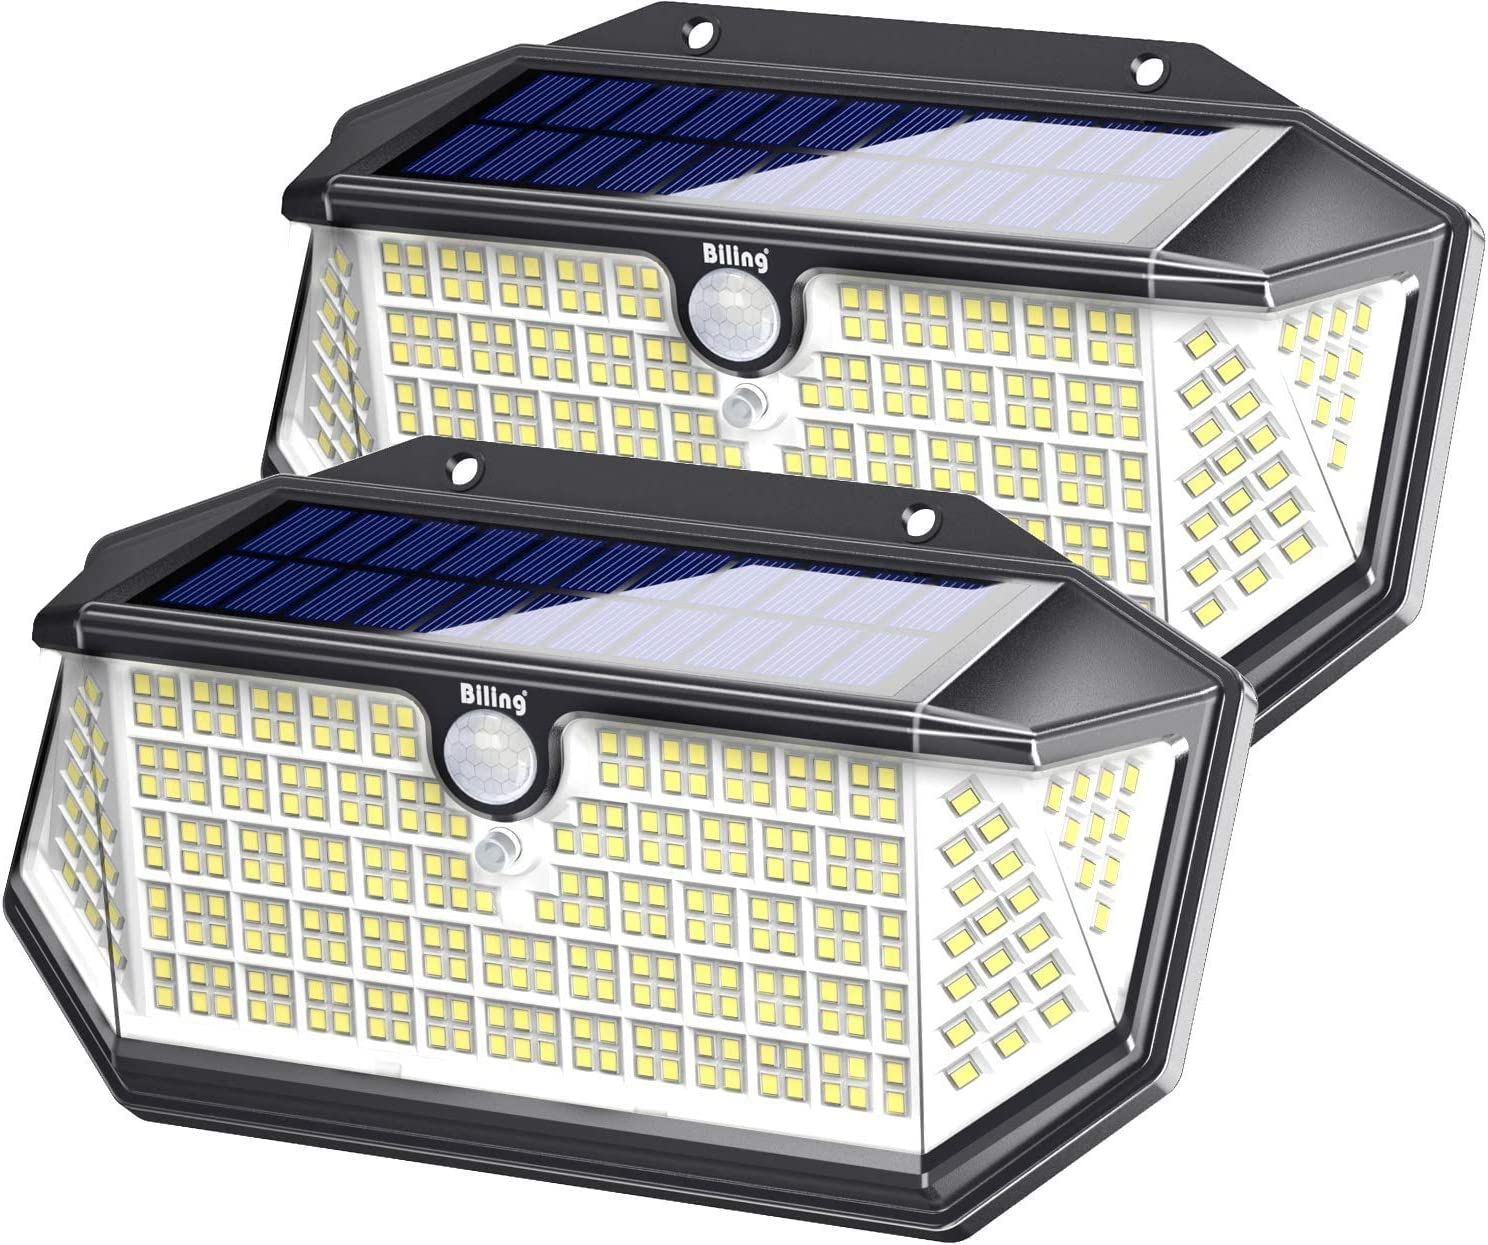 Billing 266 luces LED solares para exteriores con reflector, luces de seguridad con sensor de movimiento solar a prueba de agua IP65, luces de pared inalámbricas de 3 modos para jardín, patio(2 Pack)